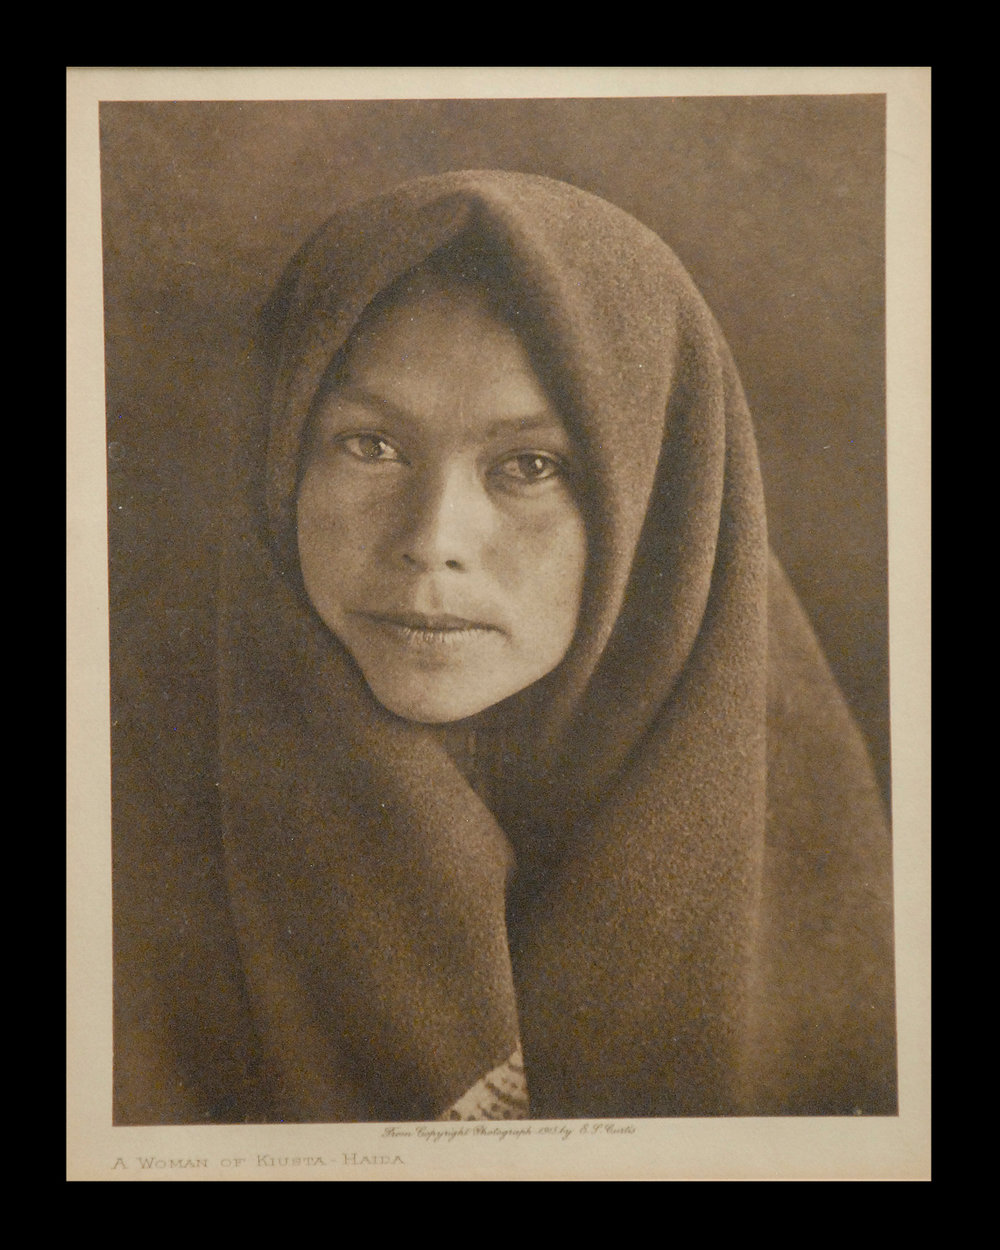 """A Woman of Kiusta-Haida"" 1915 Vol.11    Van Gelder Print,  Vintage Photogravure"